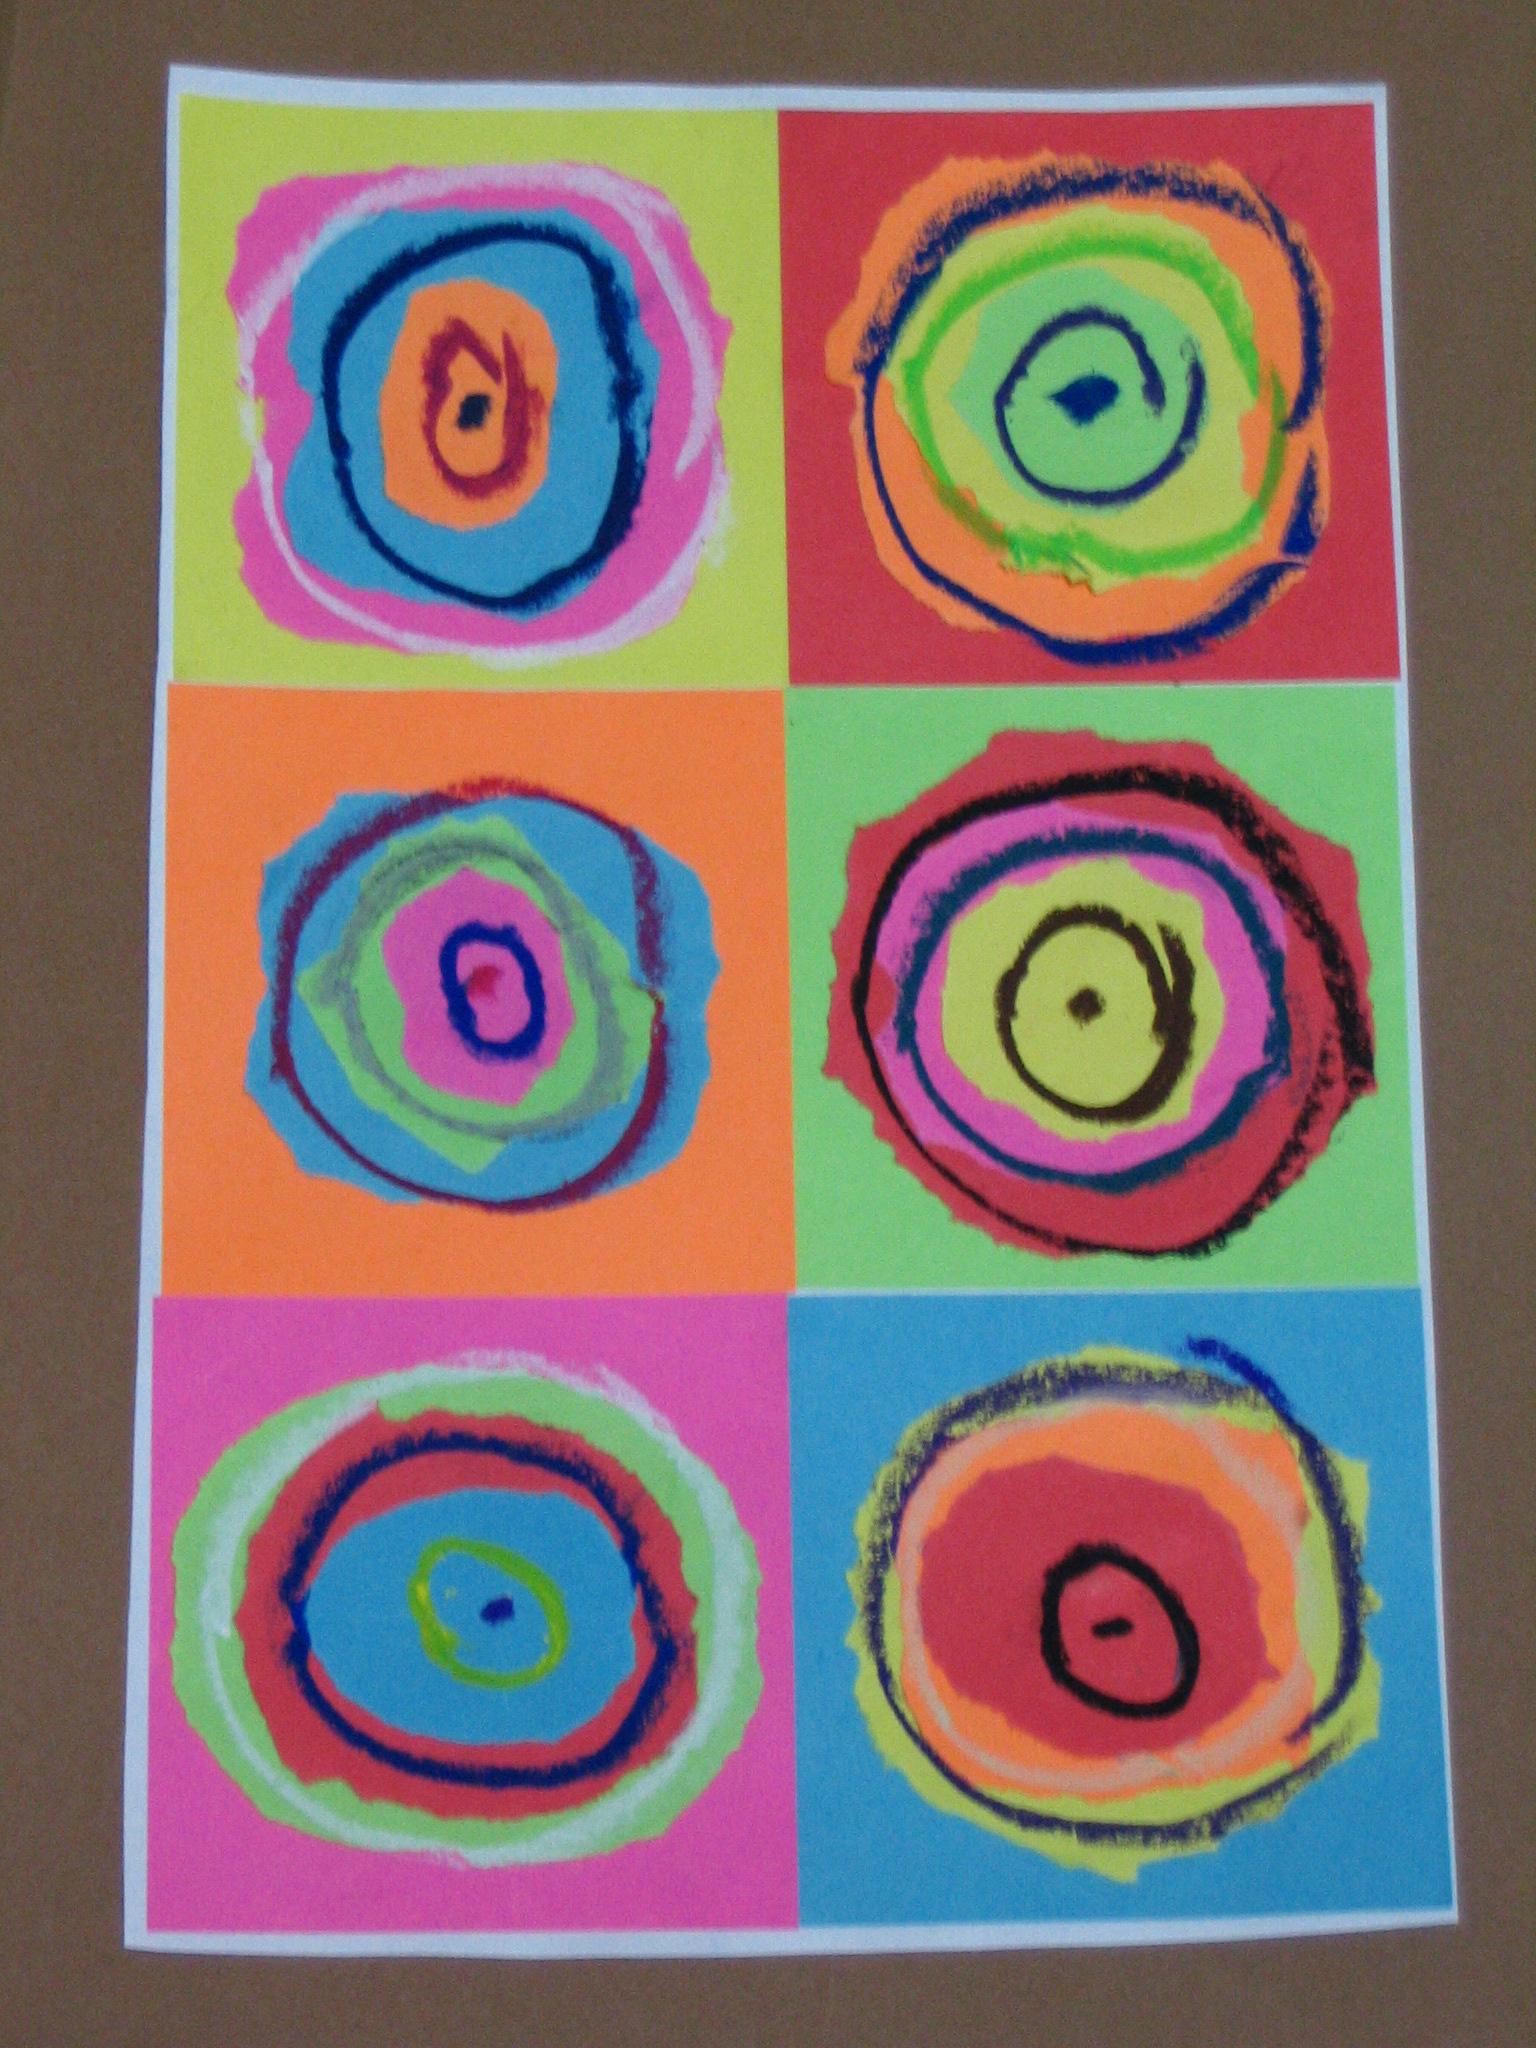 Extrêmement Era Kandinsky! Progetto di arte per bambini. | Tina Festa MF39